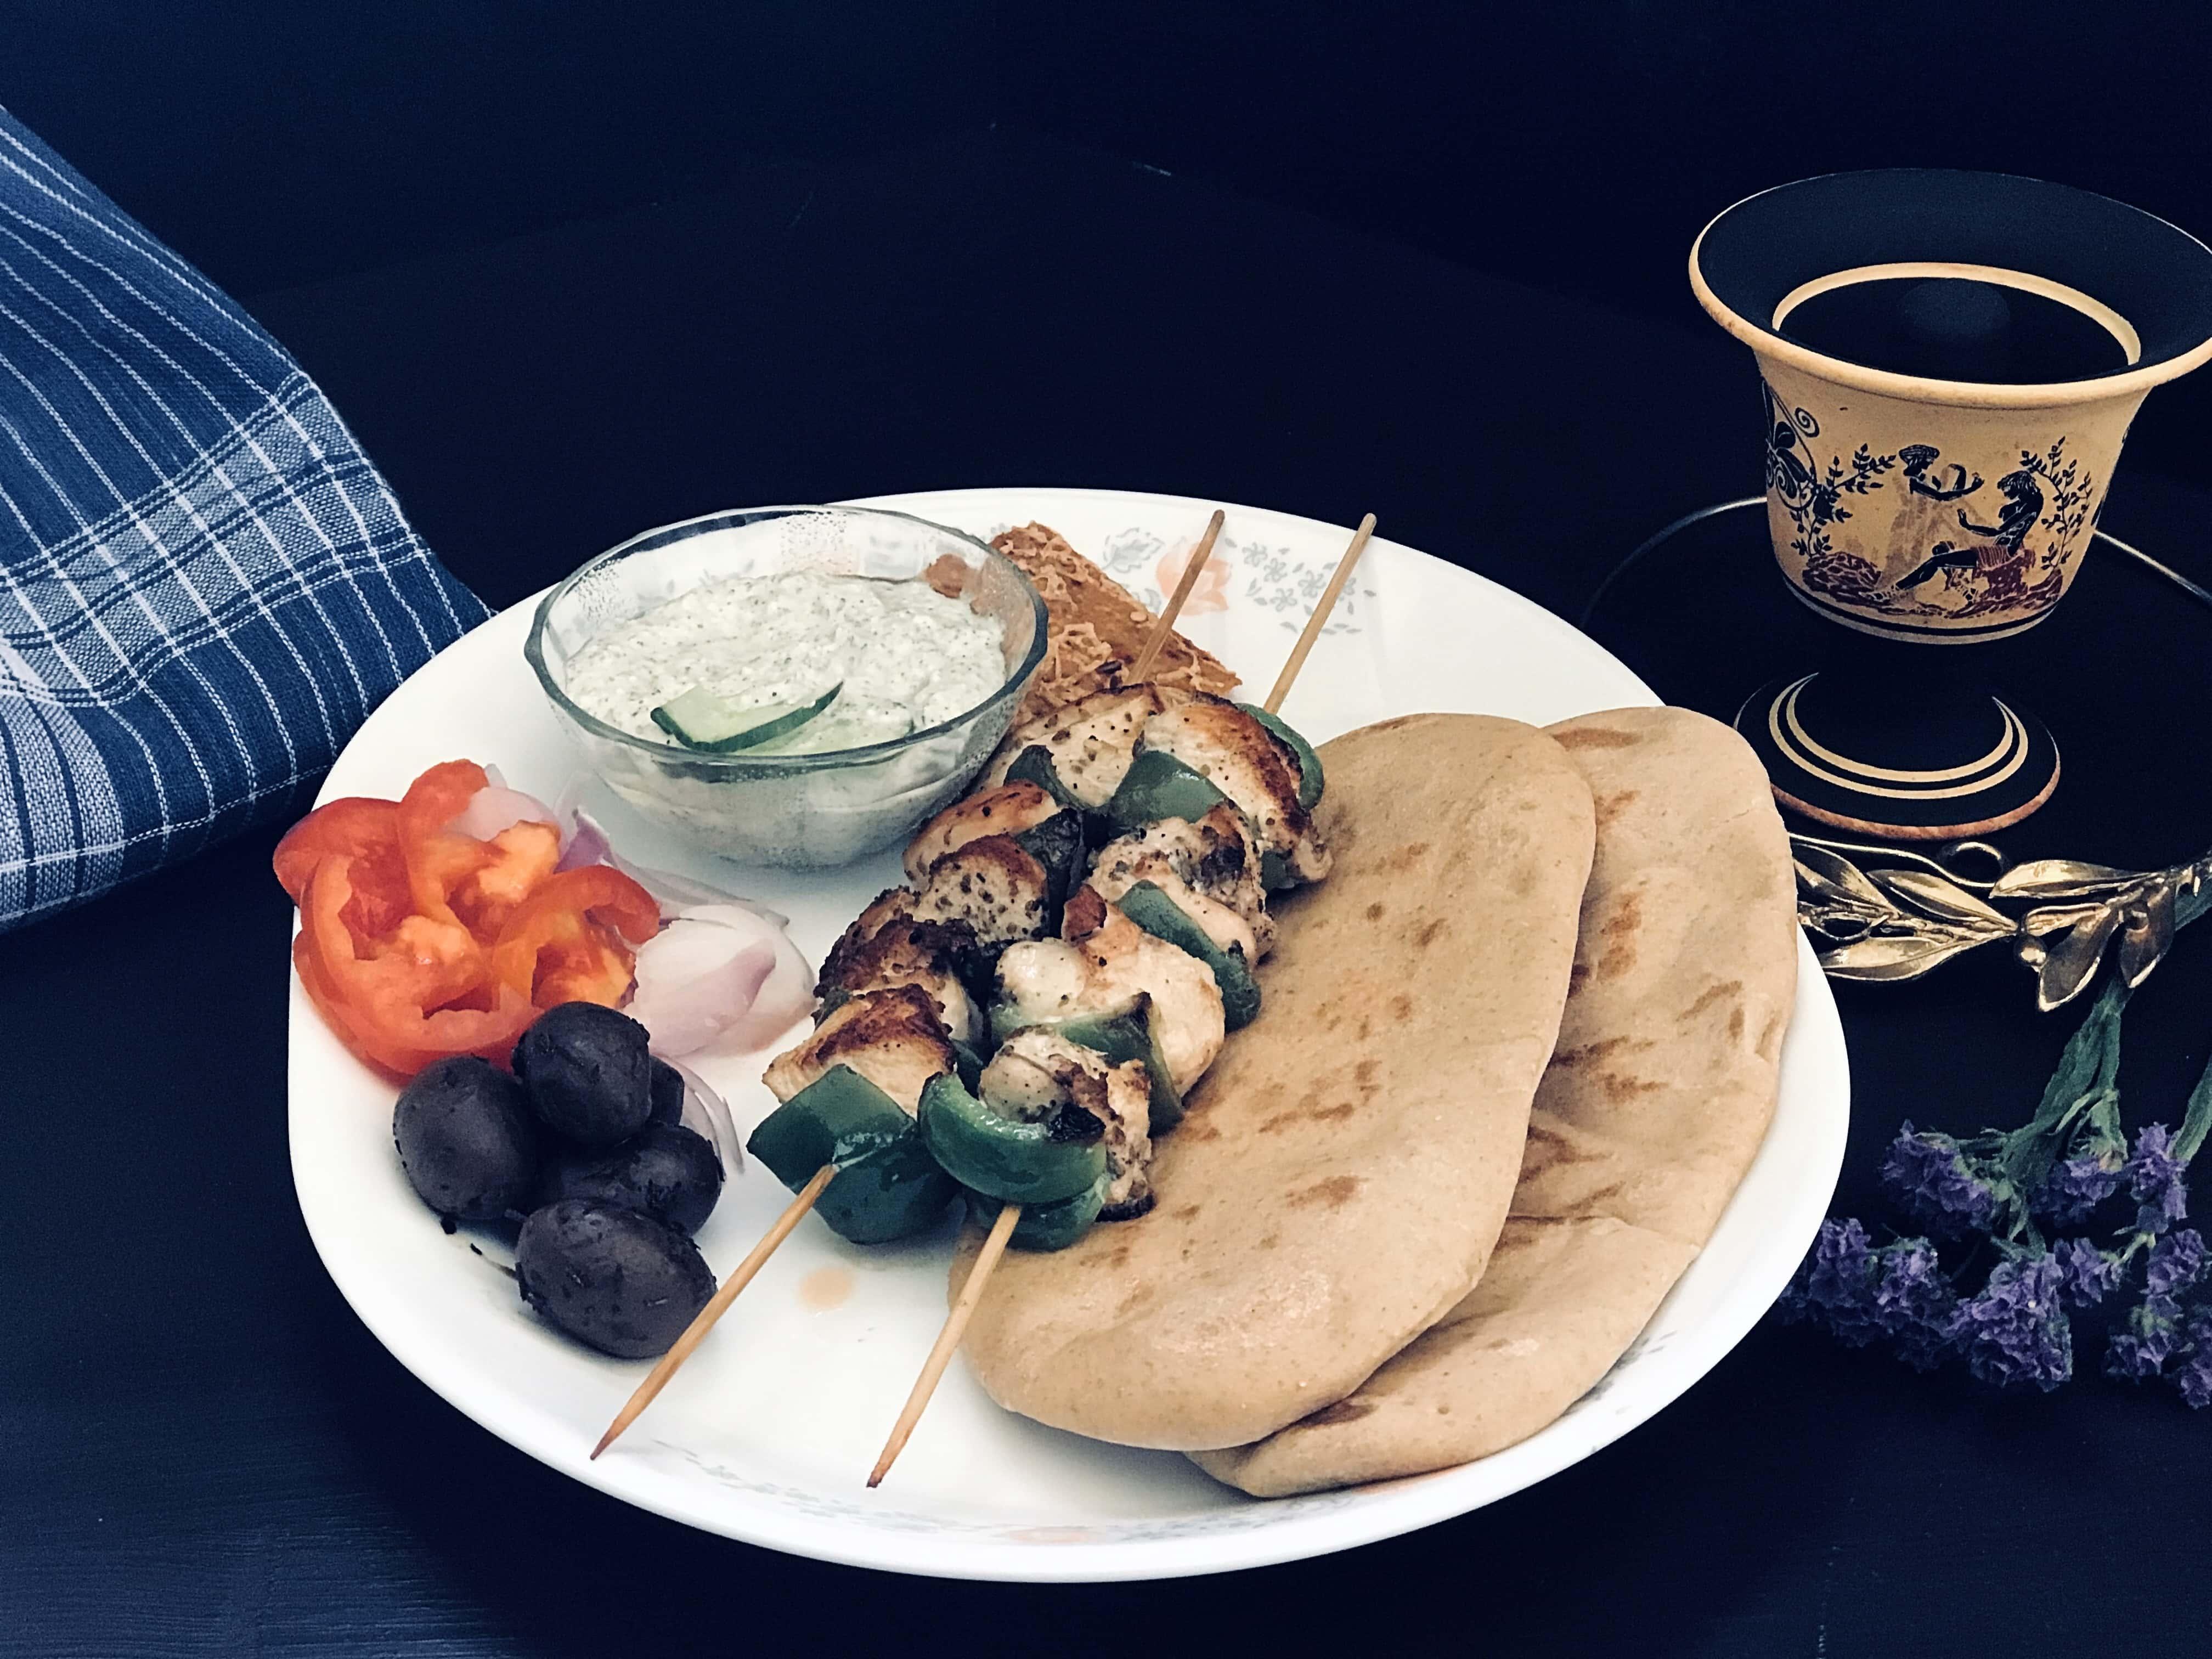 Greek Souvlaki, from the corner table, #fromthecornertable